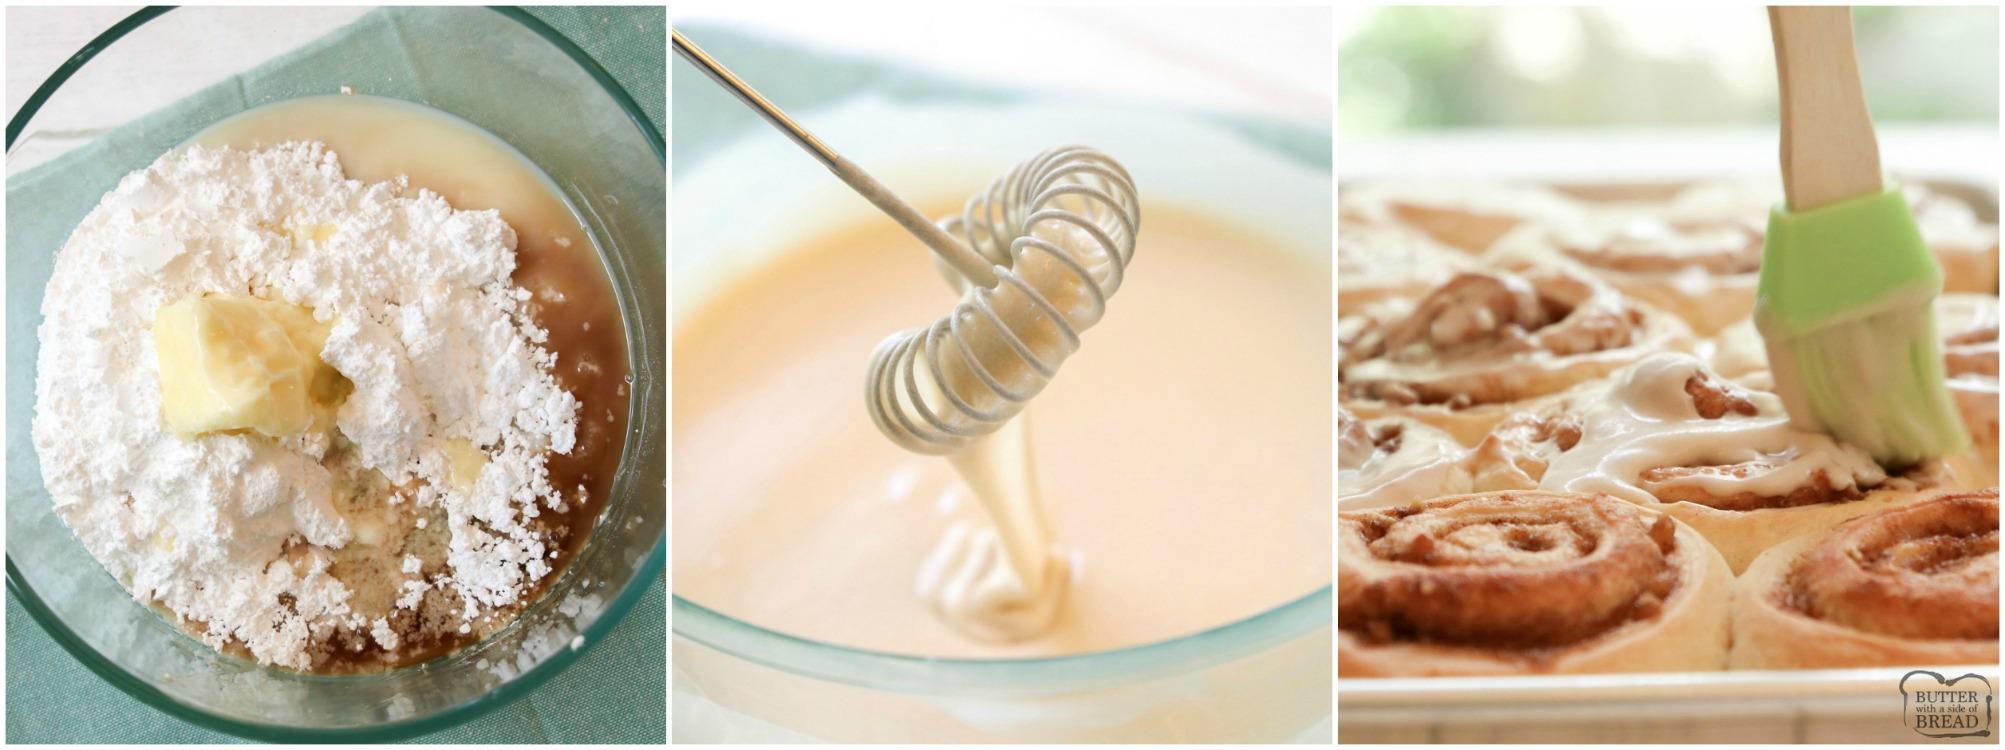 How to make the glaze for cinnamon rolls. Vanilla glaze.